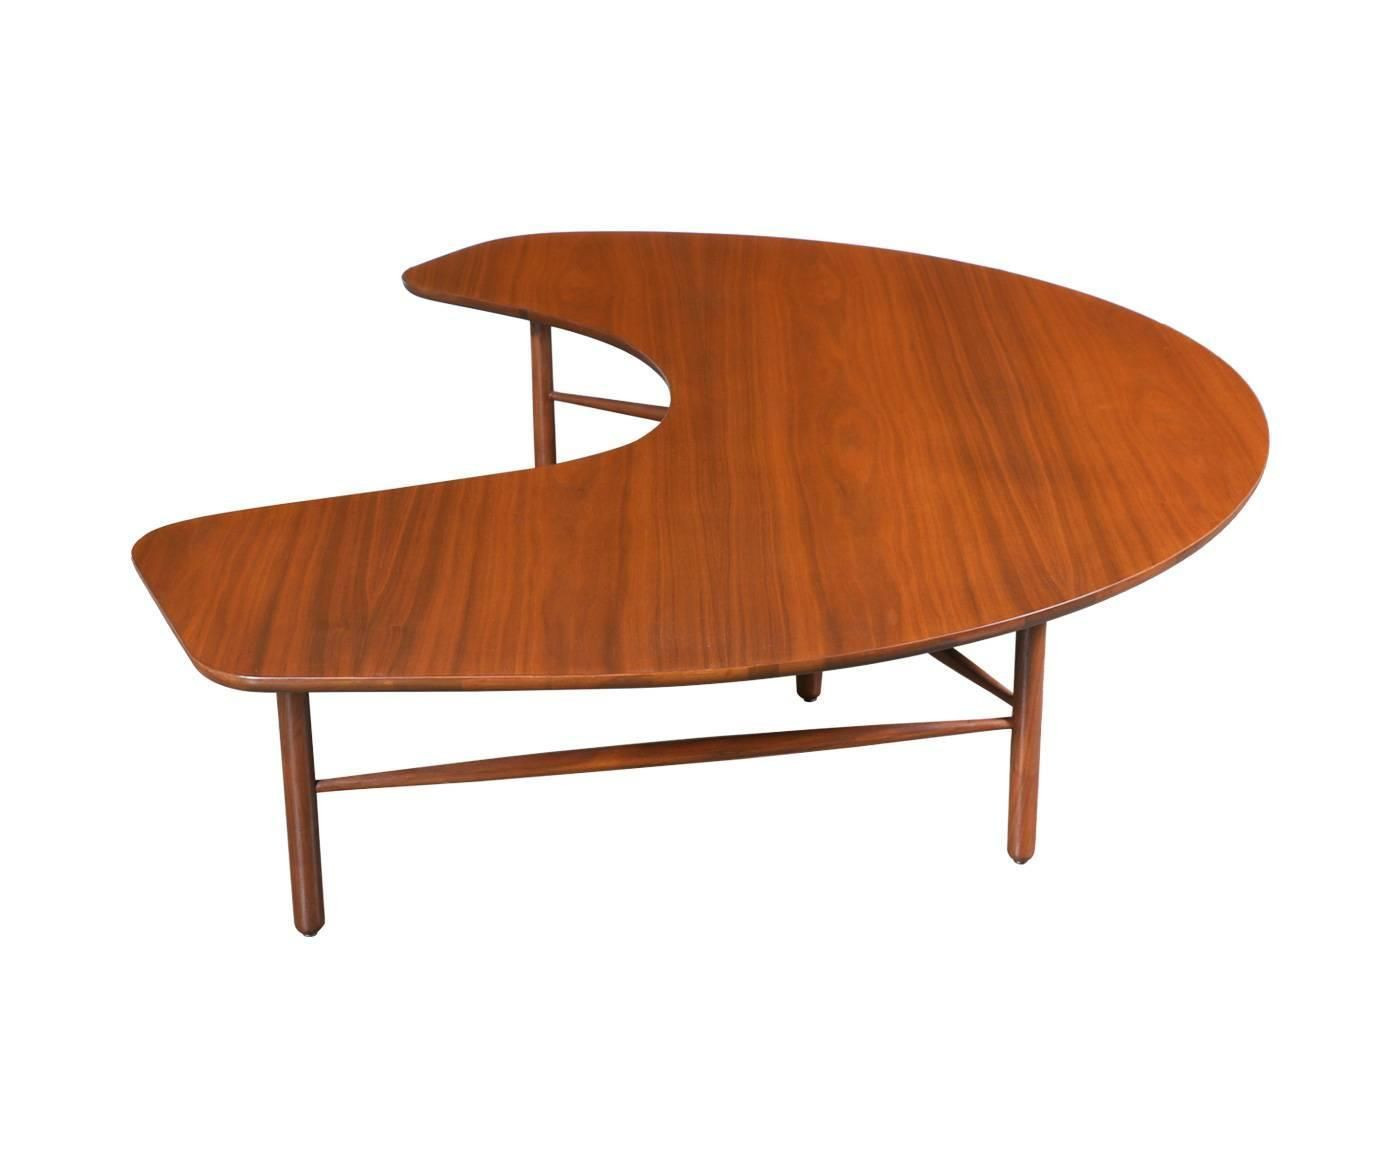 Greta grossman furniture designed by greta magnusson greta grossman furniture designed by greta magnusson grossman for glenn of california c 1952 greta grossman pinterest designers and mid geotapseo Gallery